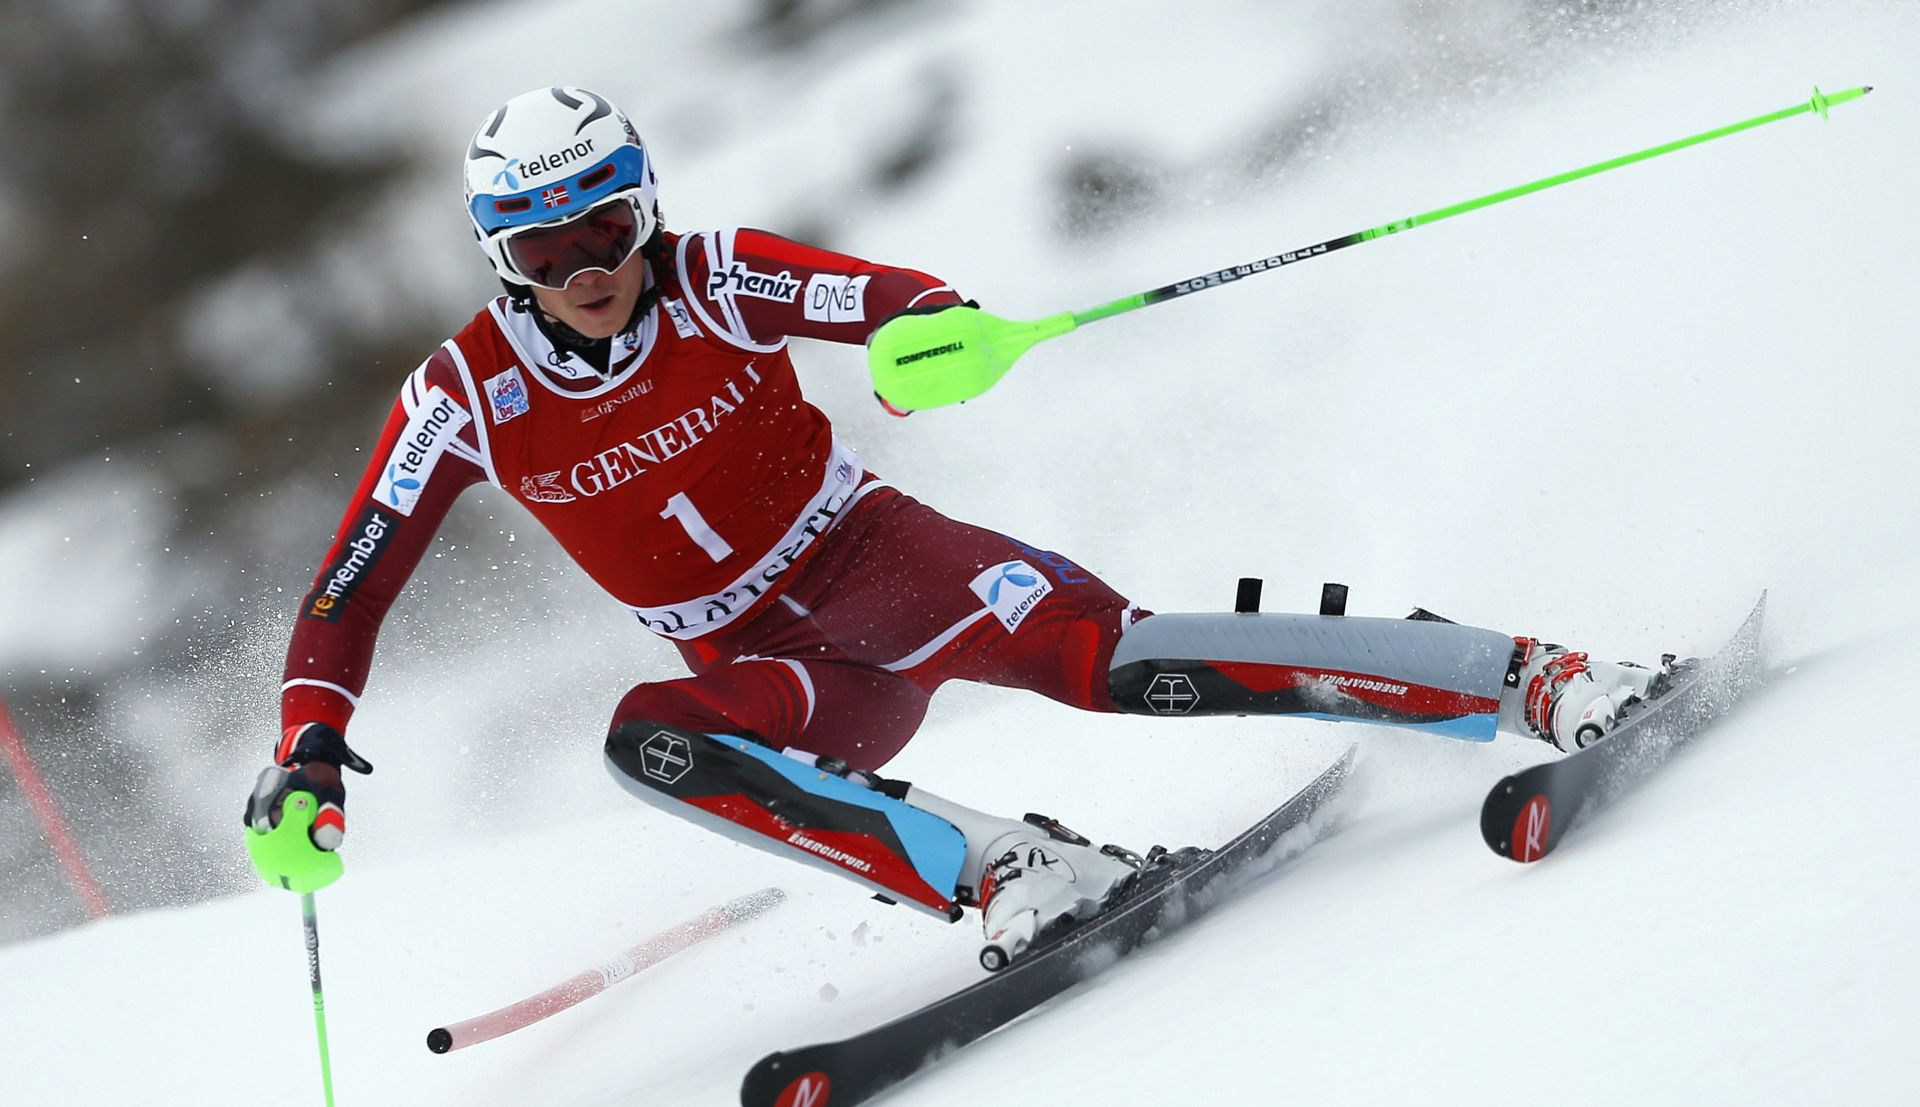 Val d'Isere, slalom (m): Pobjeda Norvežanina Kristoffersena